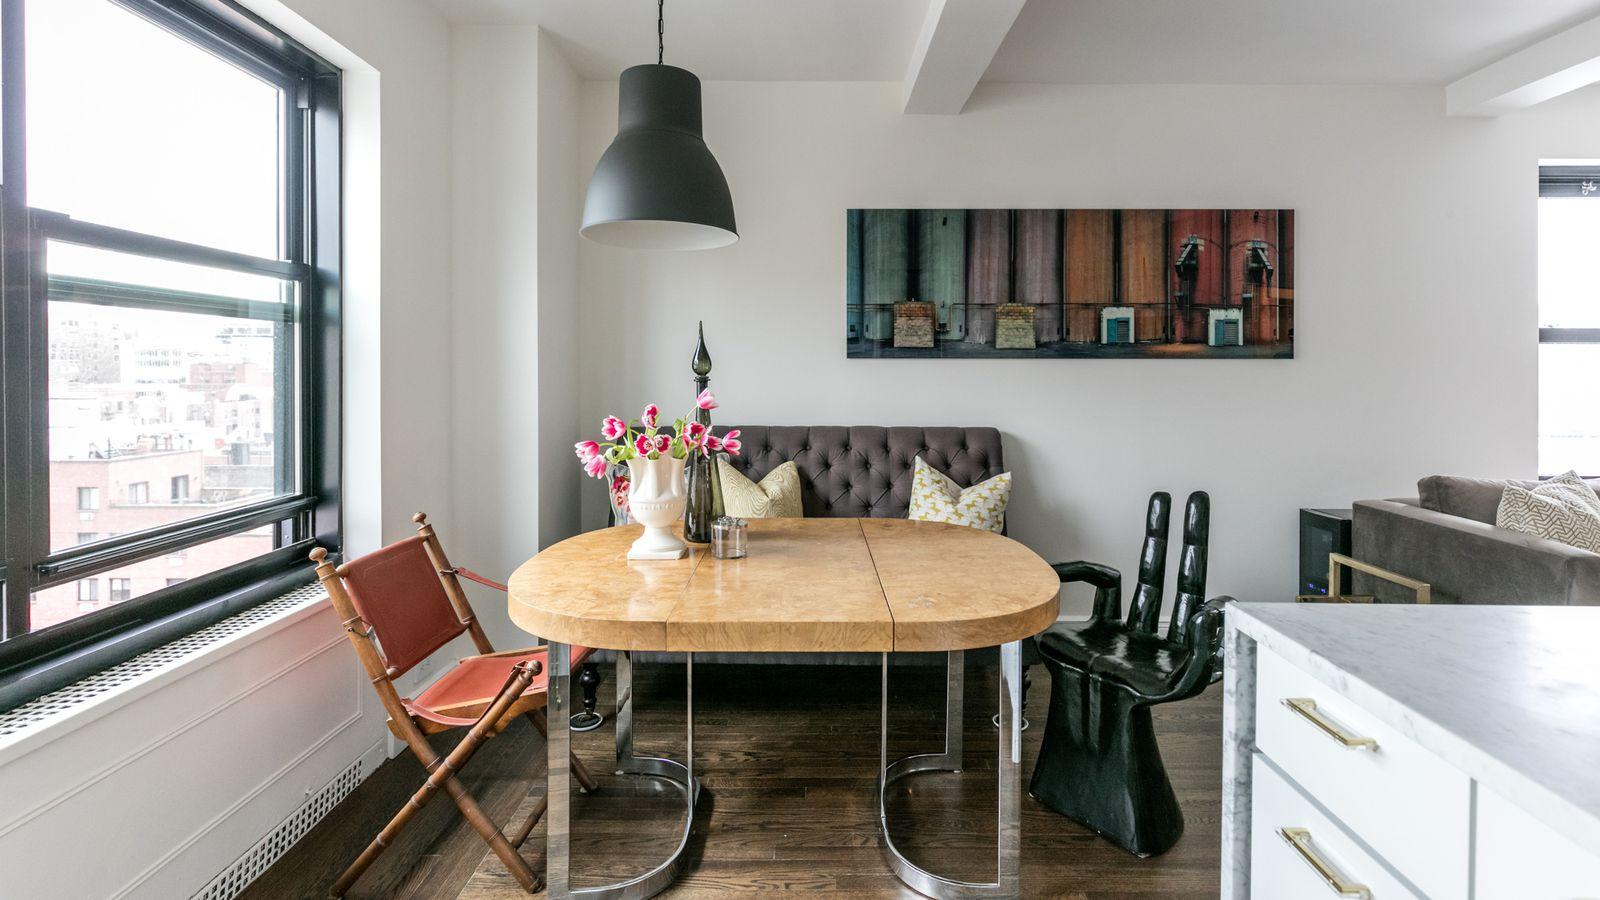 An Interior Designers Gut Renovation Transforms a Dated